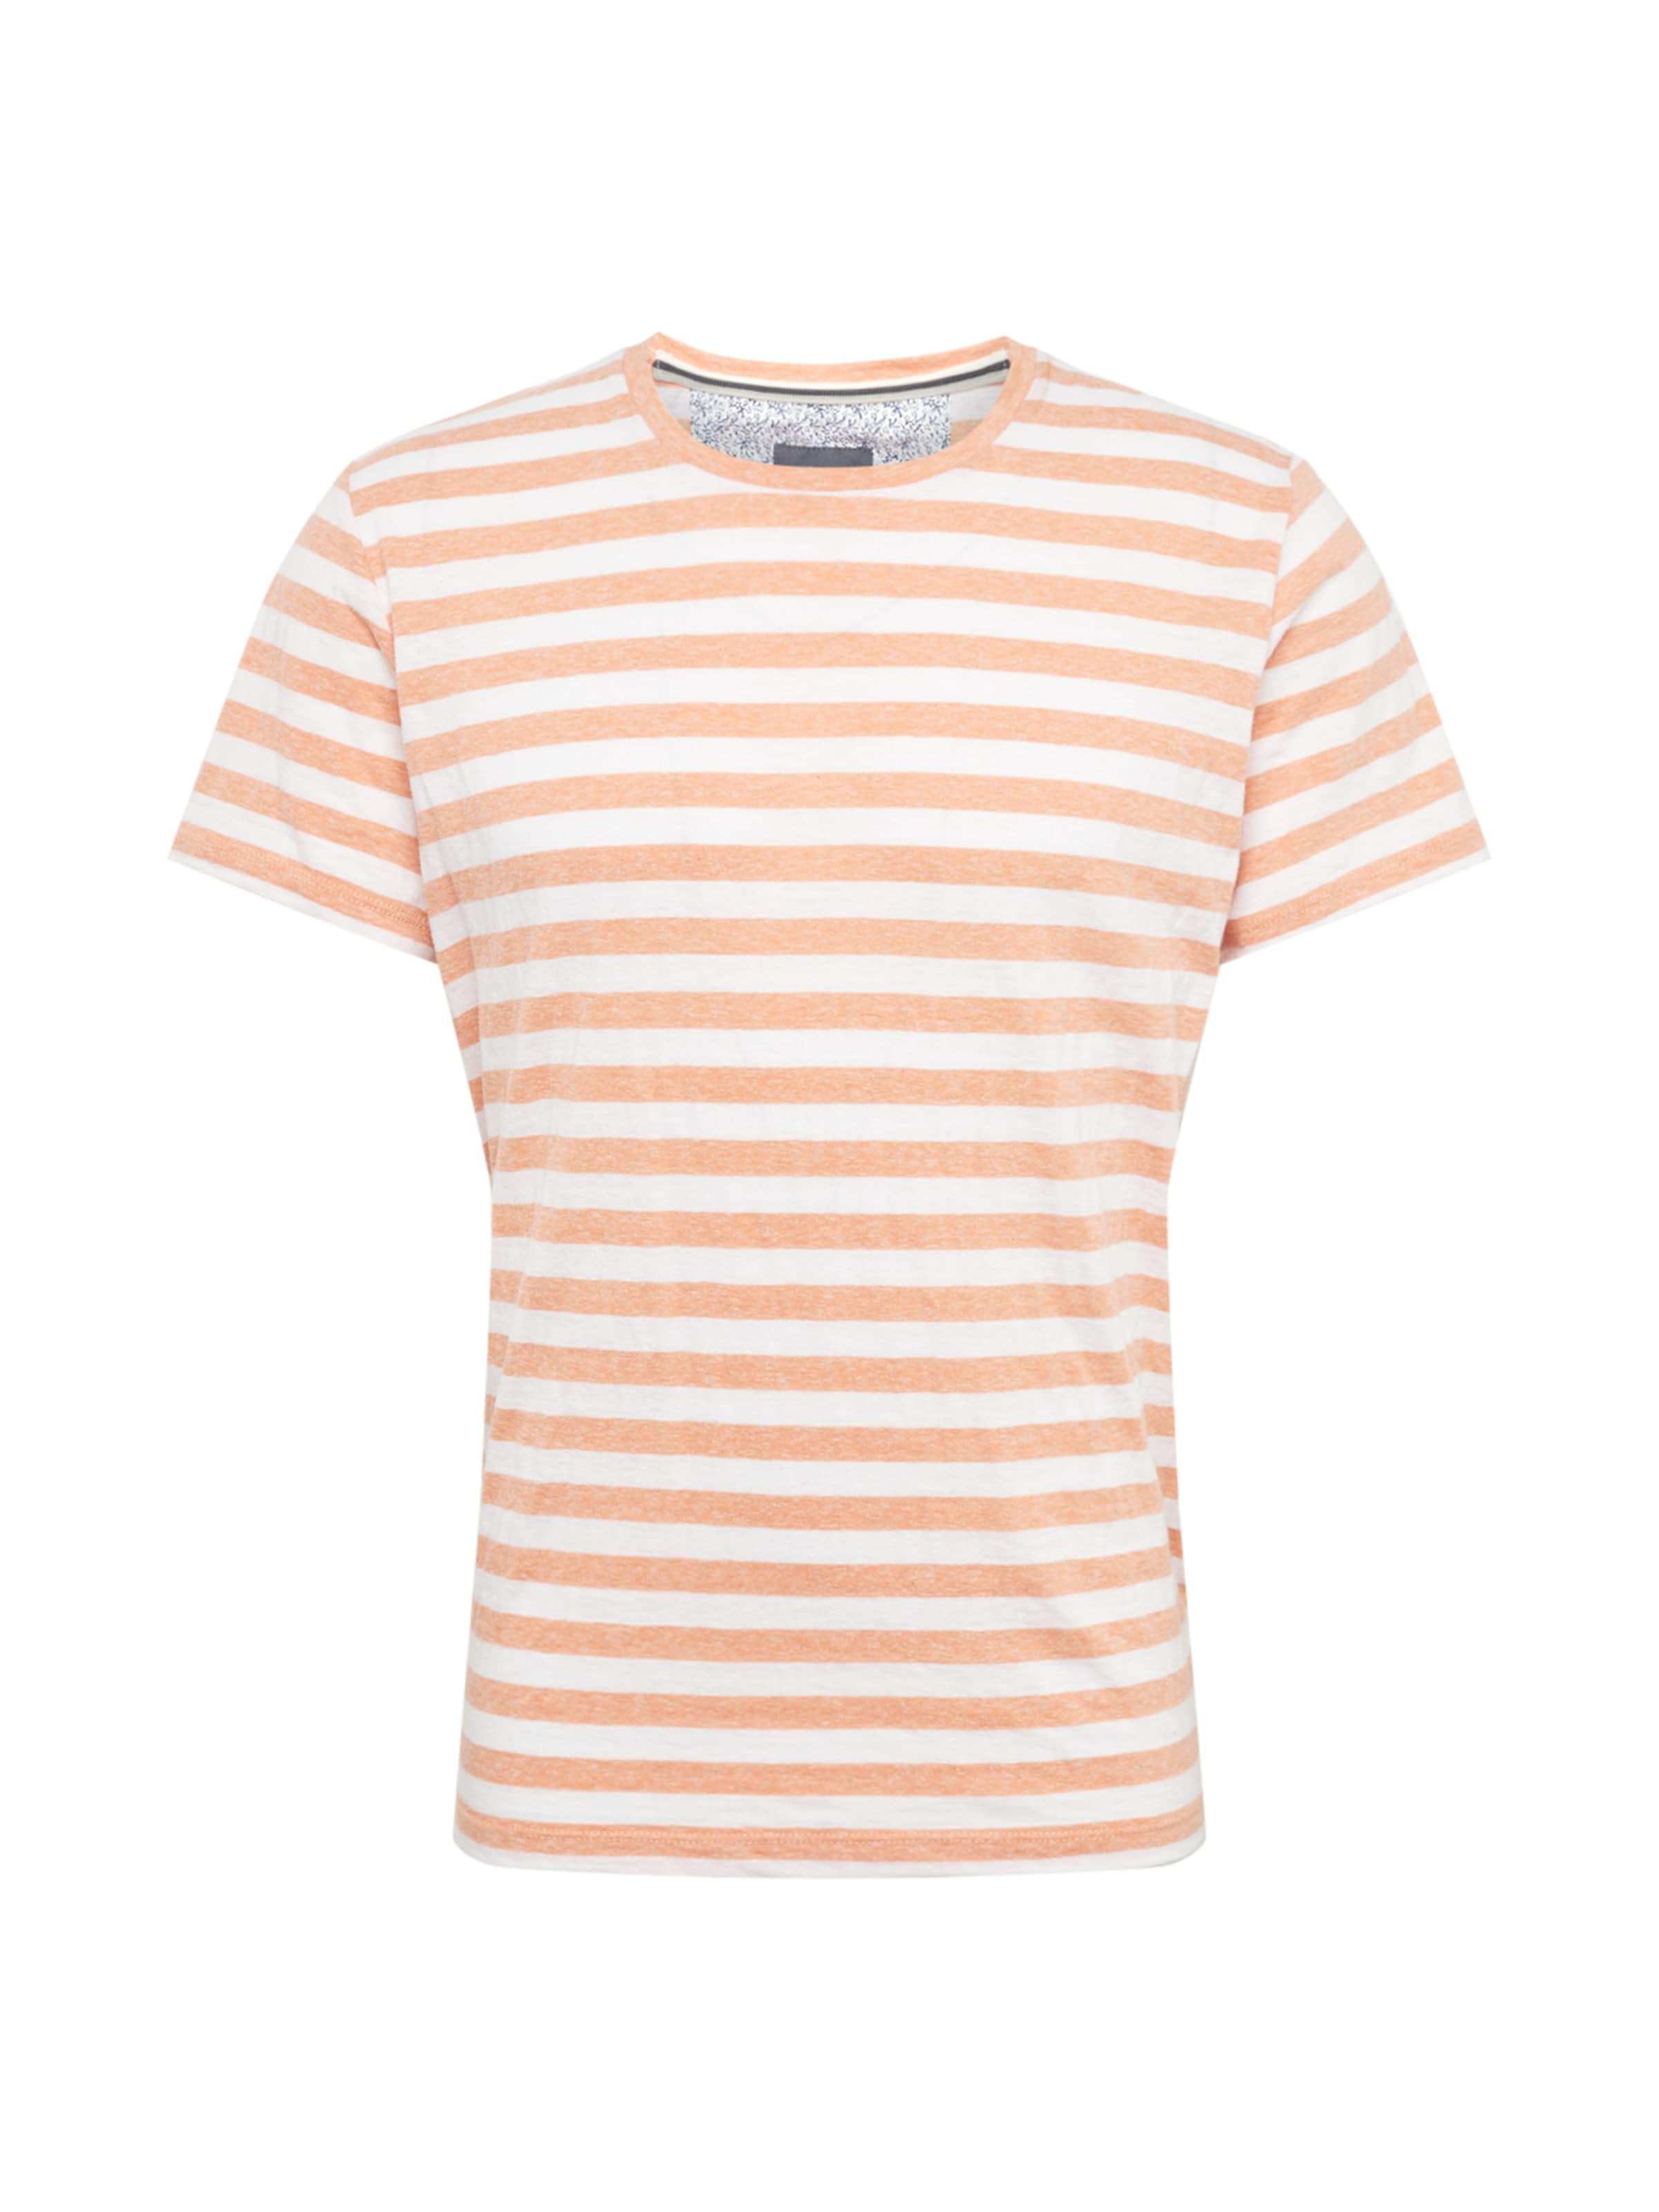 Red Label S T Orange shirt ChinéBlanc En oliver IDH9W2E